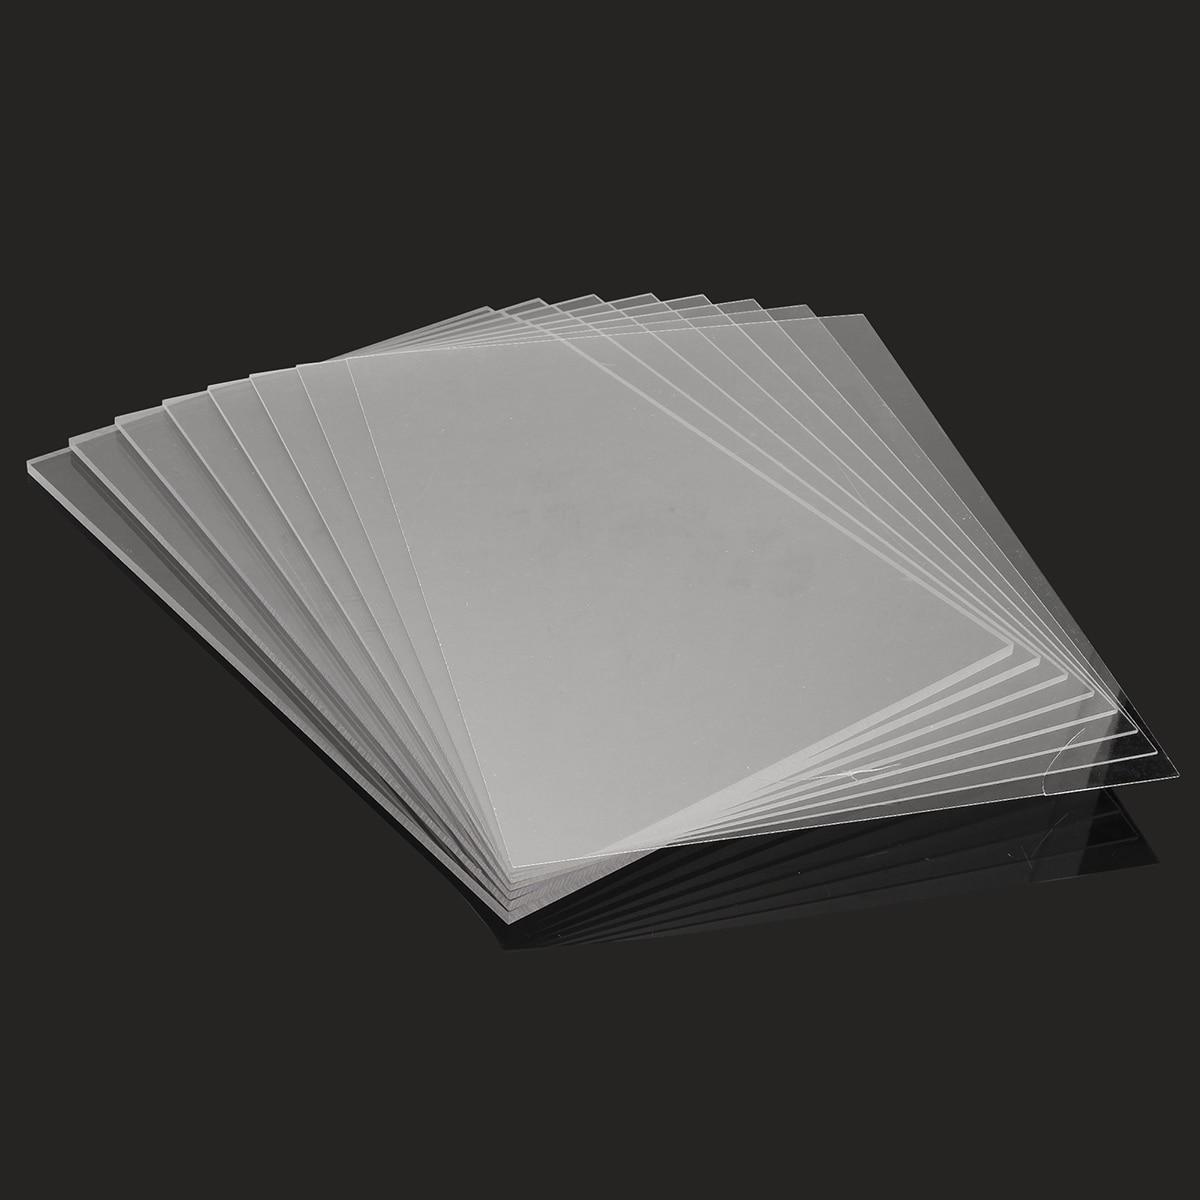 1Pcs A2 420x594mm Acrylic Perspex Sheet Cut Panel Plastic Satin Gloss Board Acrylic Sheet DIY Model Material Plexigla 5/6/8/10MM